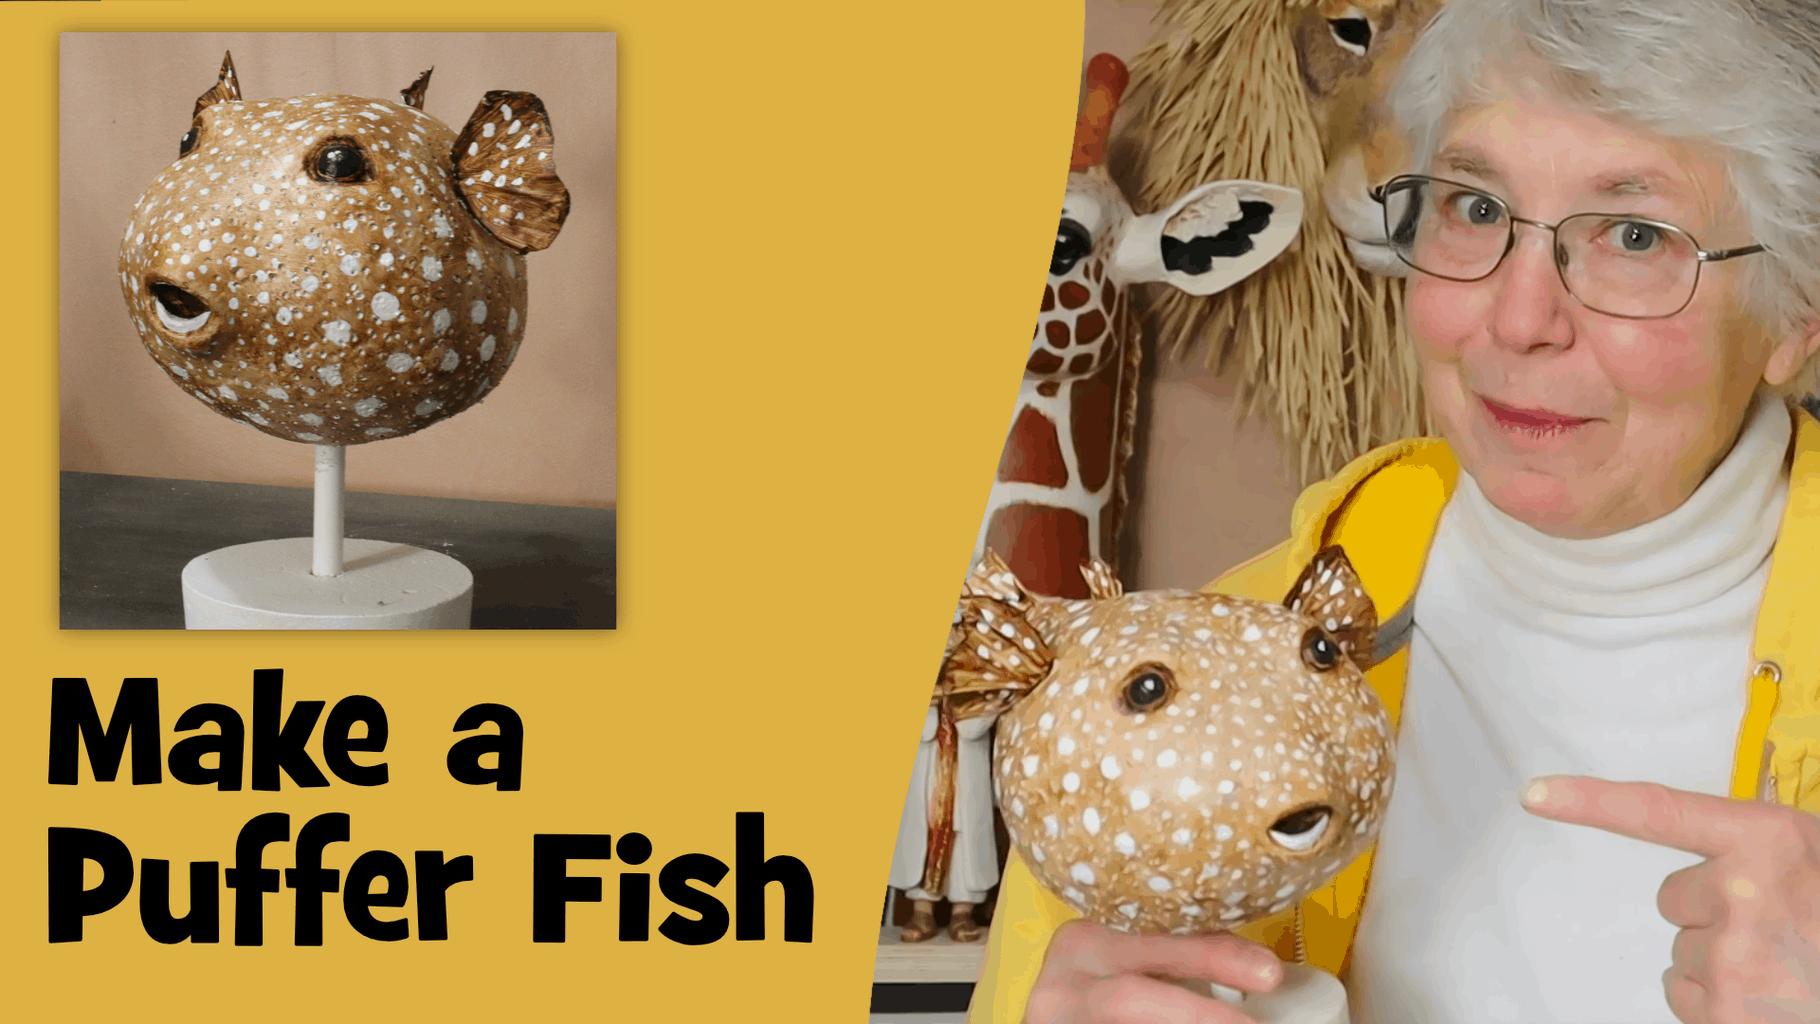 Make a Puffer Fish